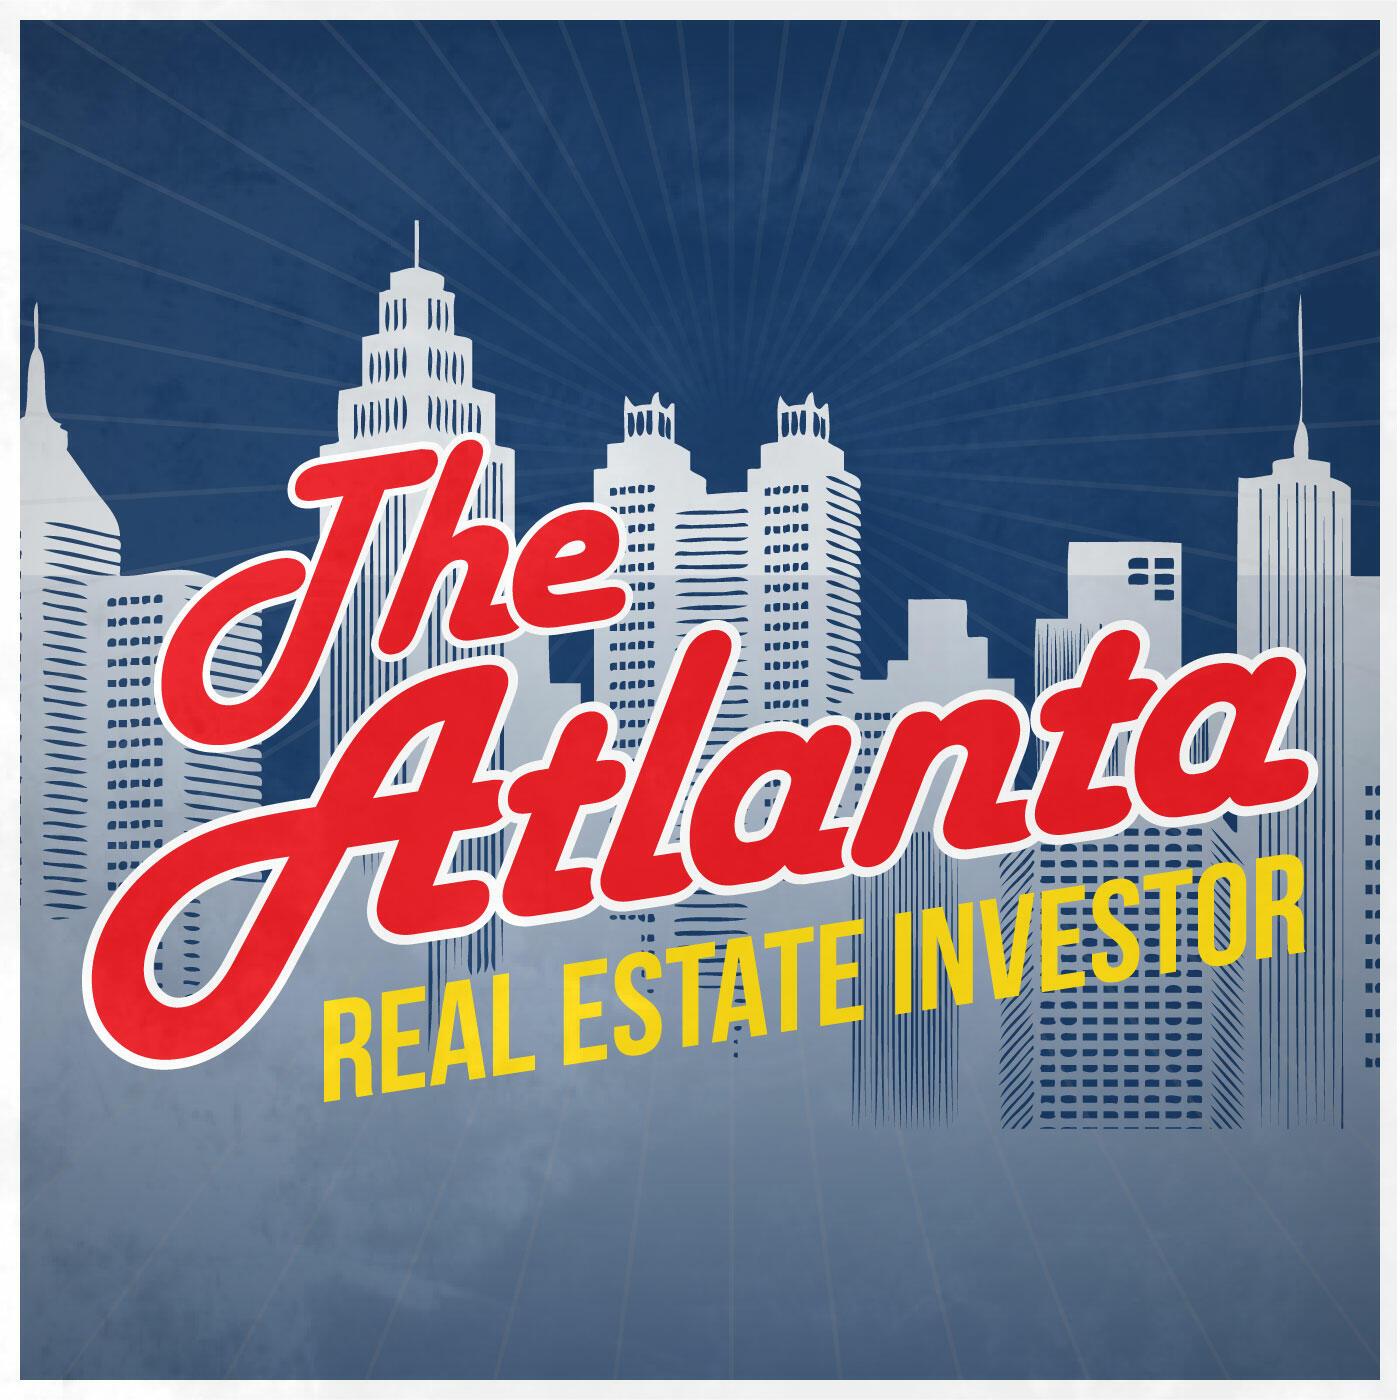 The Atlanta Real Estate Investor